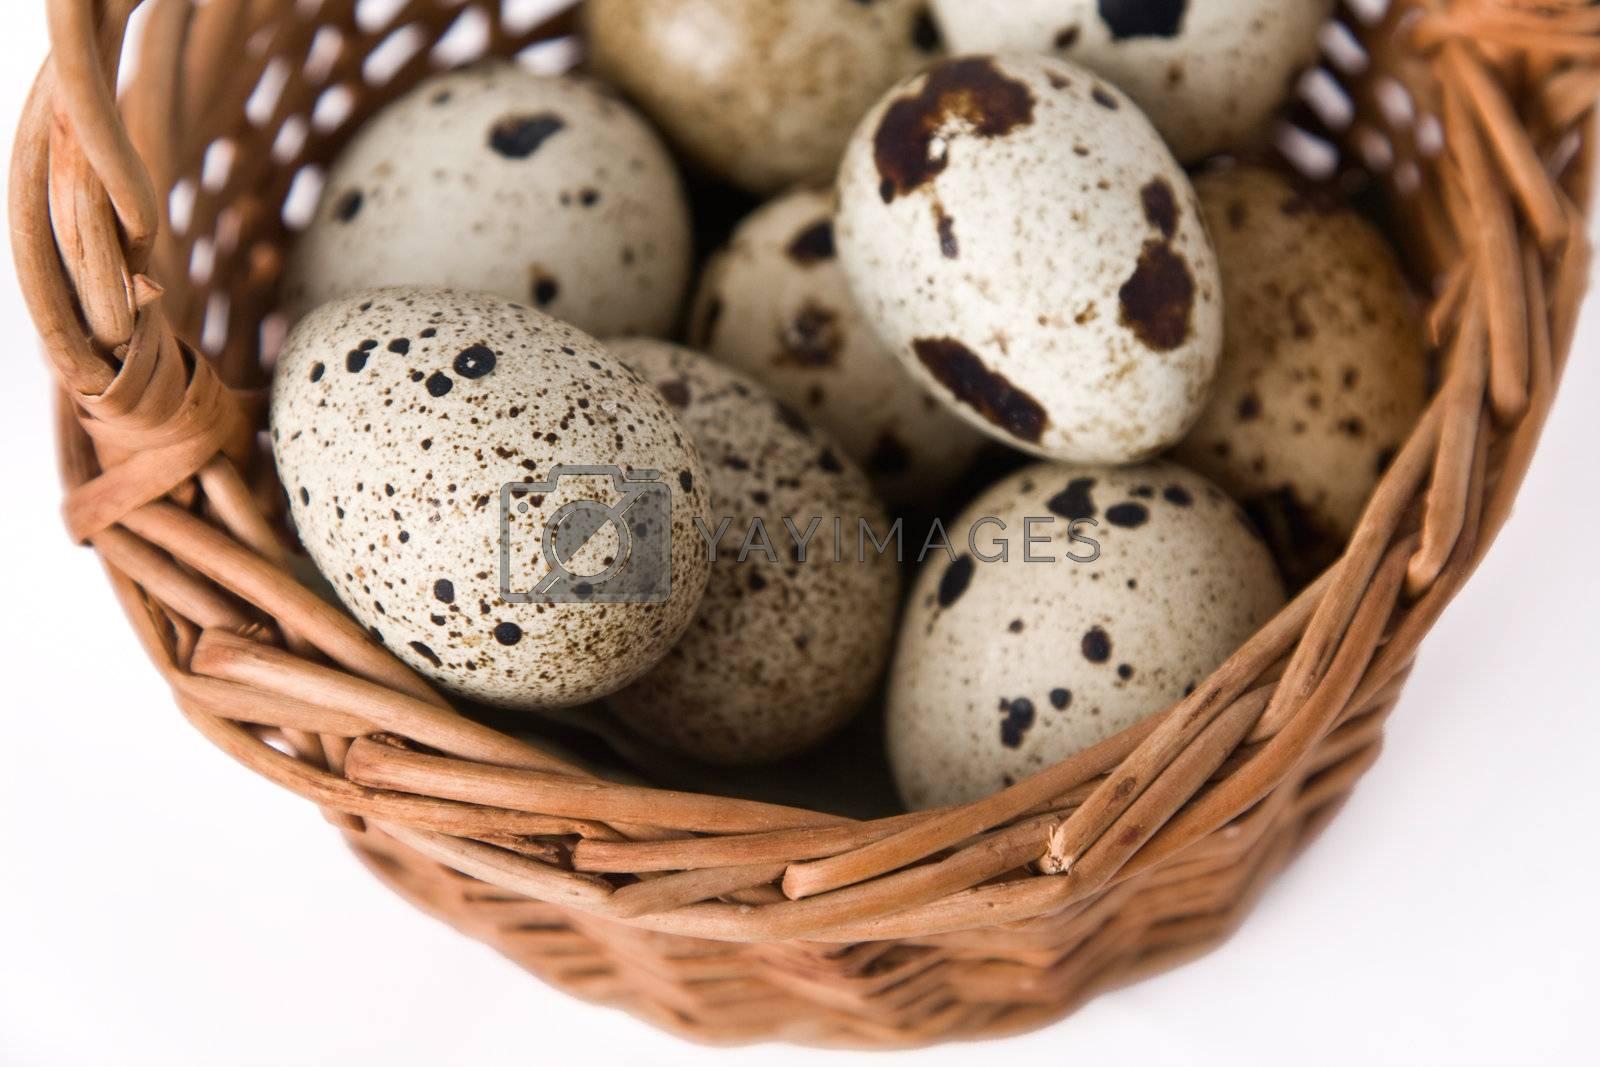 quail eggs by Shvydkova